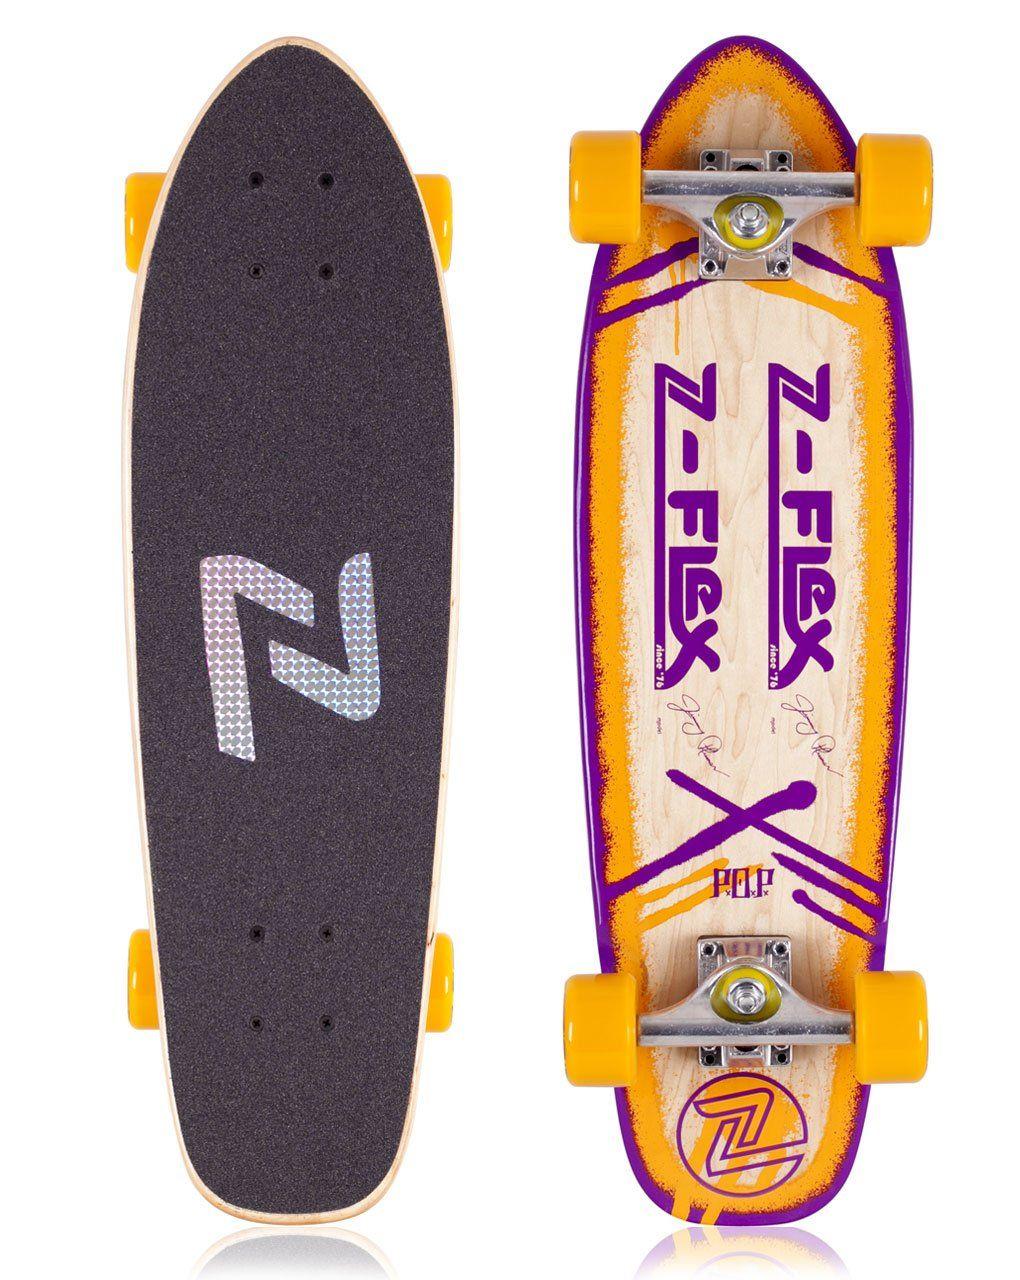 Z Flex Jimmy Plumer 27 75 X 7 75 Cruiser Skateboard Complete P O P Orange Deck Construction 7 Ply Canadian Roc Skateboard Cruiser Skateboards Skateboards